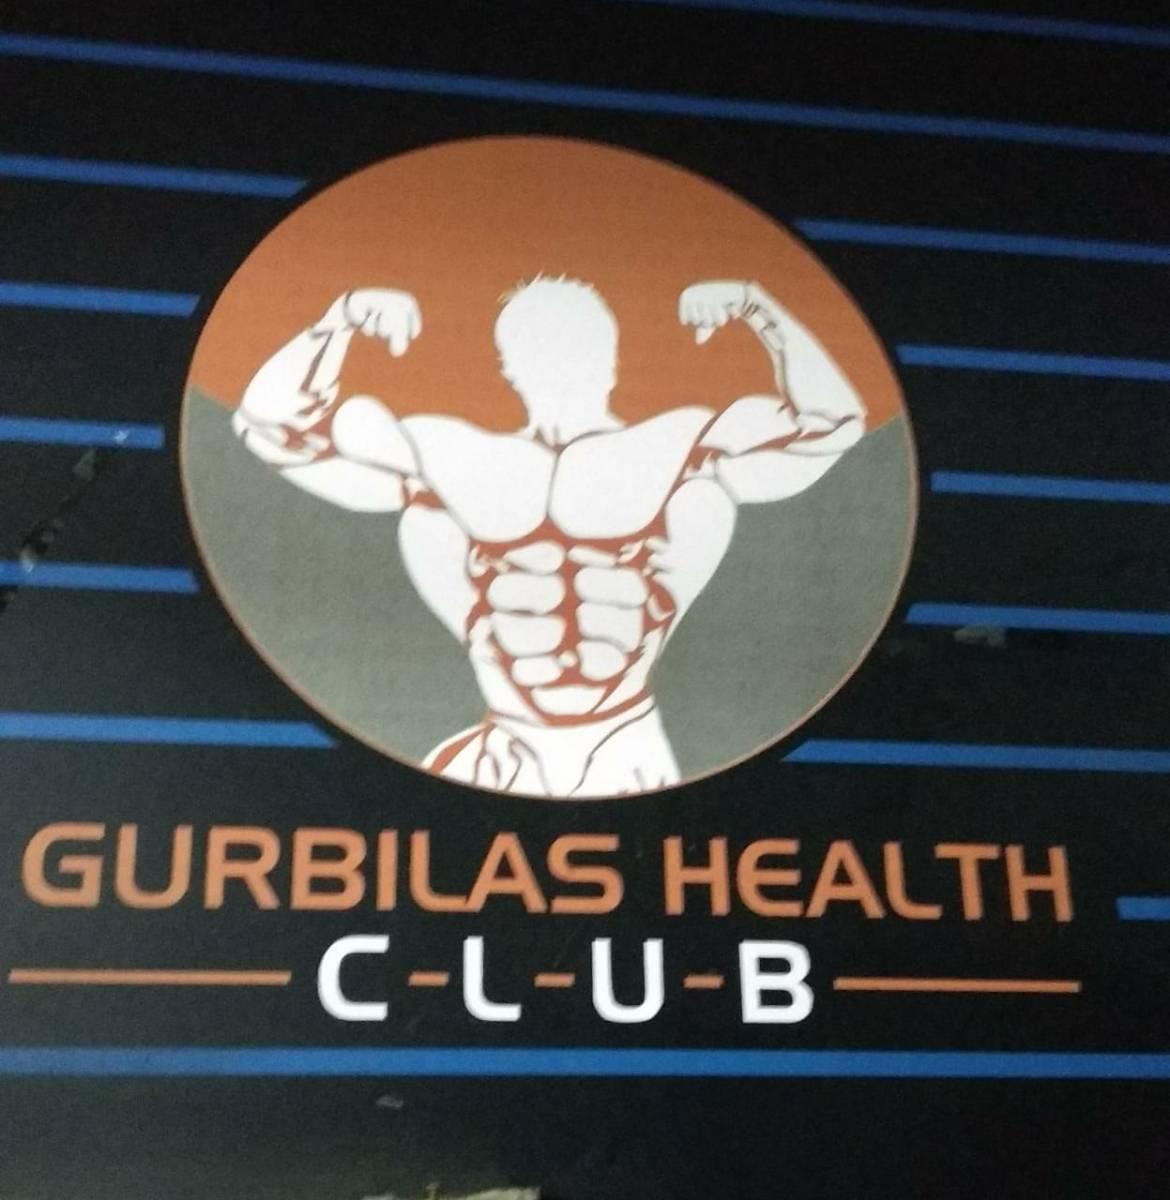 mohali-phase-1-Gurbilas-Health-Club_1686_MTY4Ng